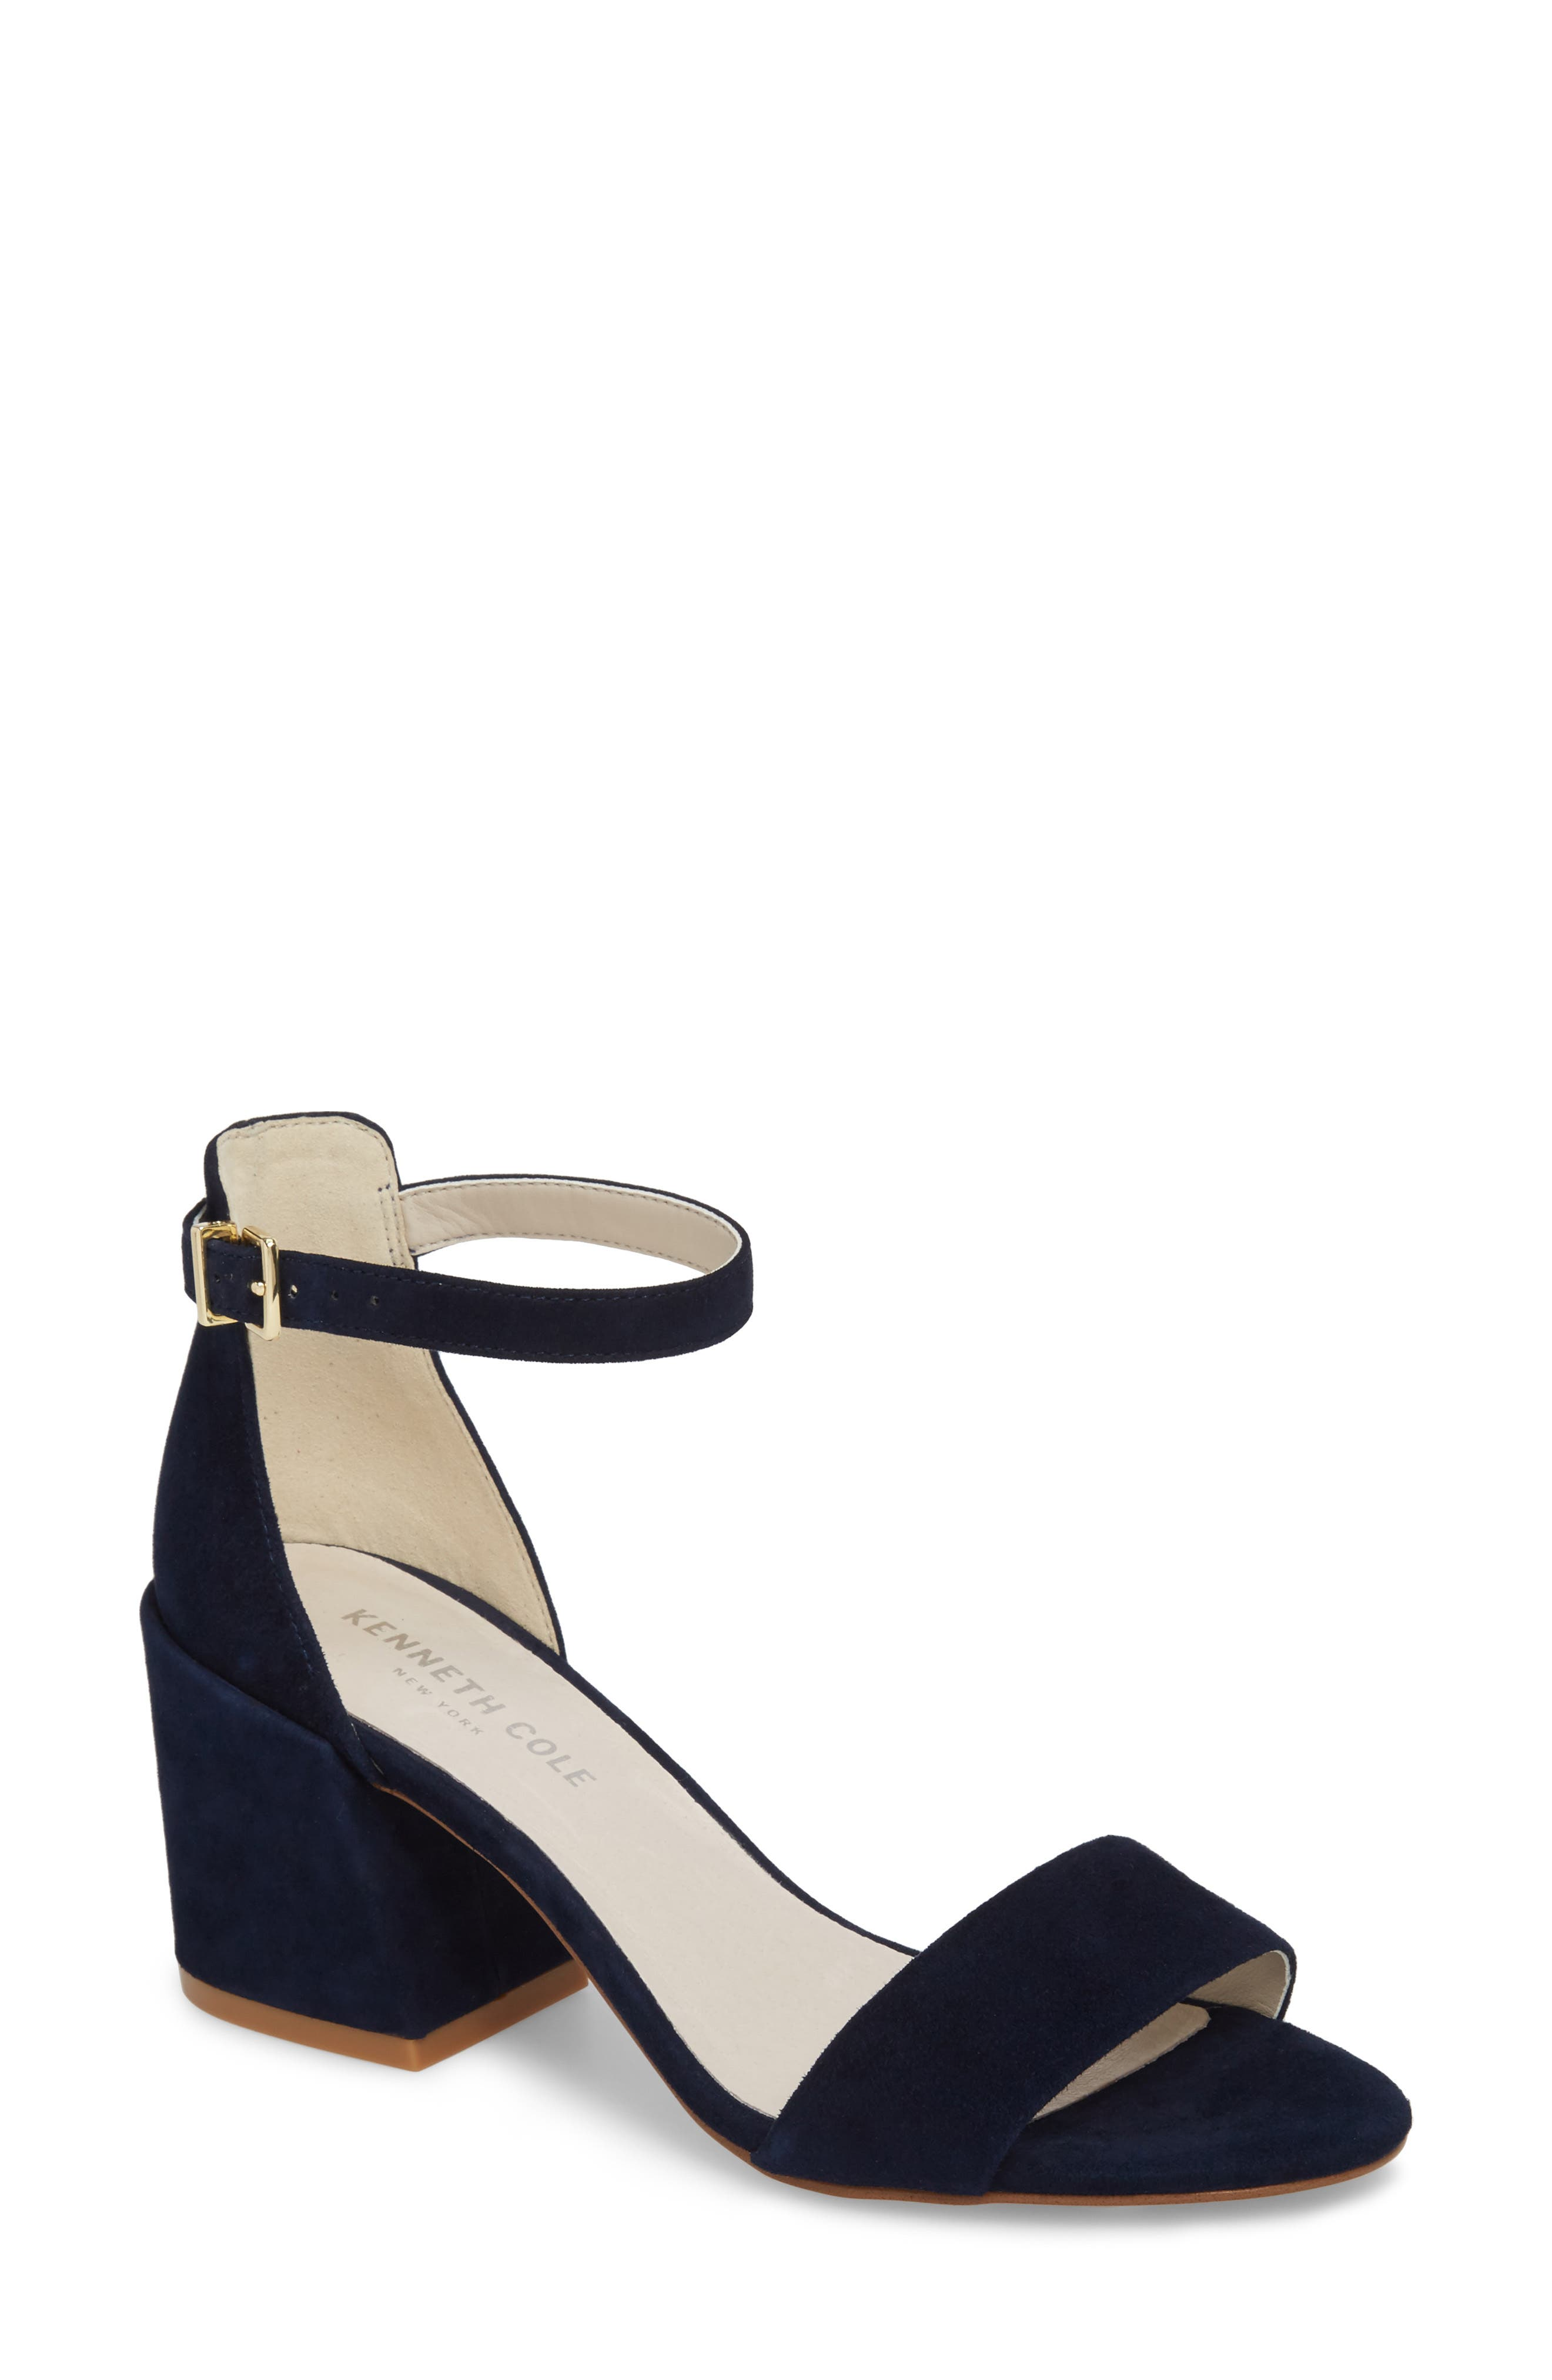 Hannon Block Heel Ankle Strap Sandal,                         Main,                         color, Navy Suede